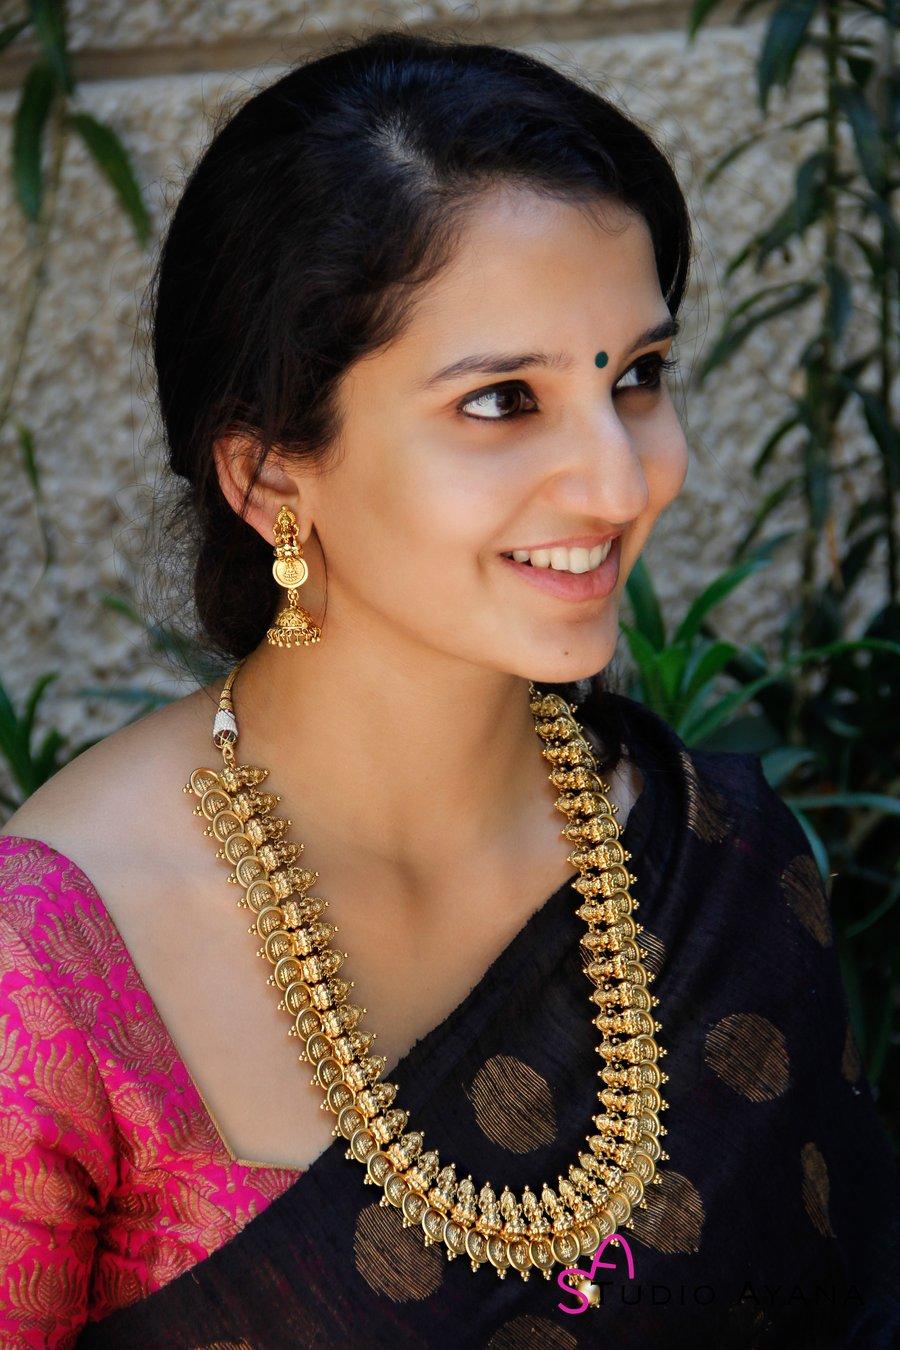 antique-jewellery-designs-2019 (3)